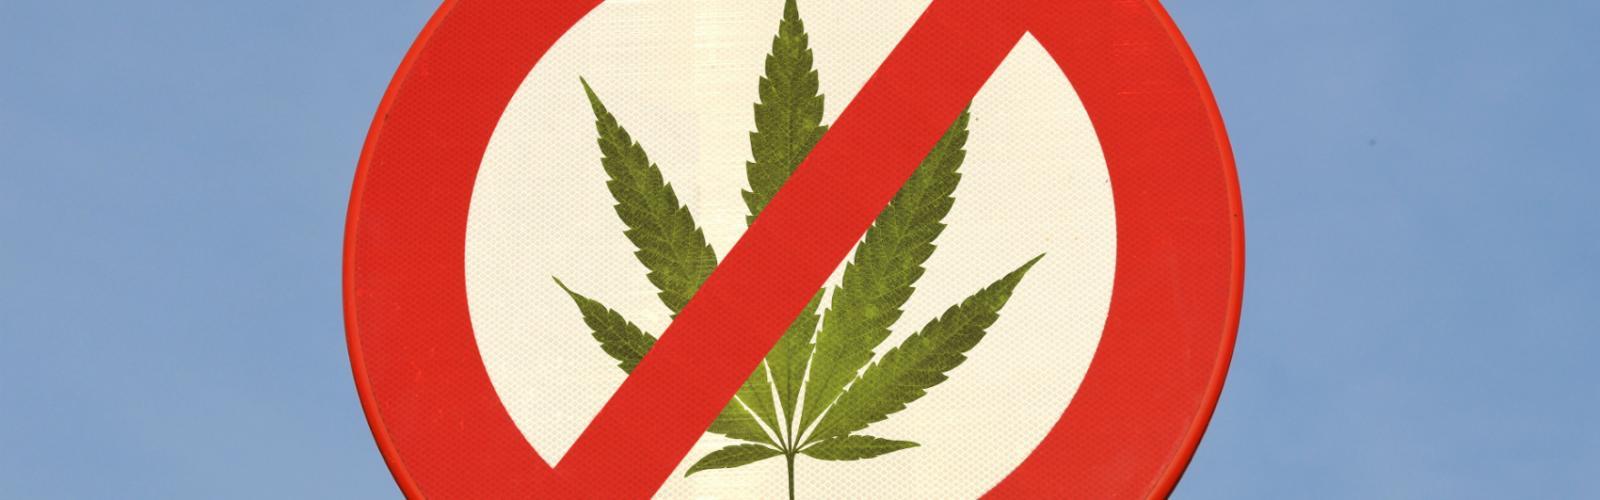 Prohibition Cannabis Simbol